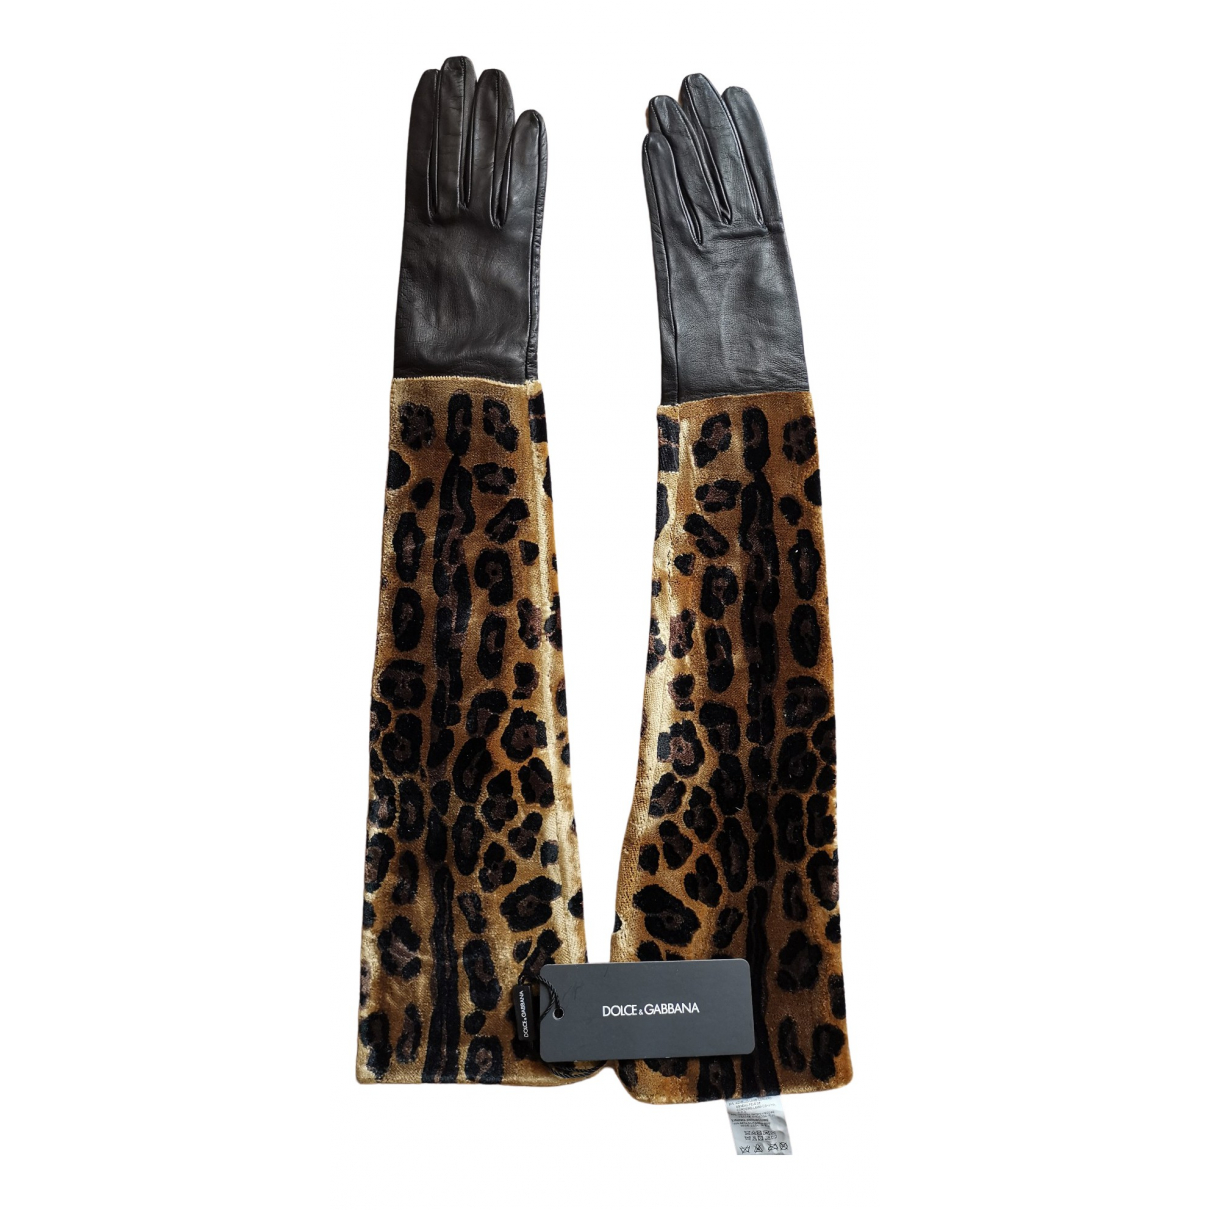 Guantes largos de Cuero Dolce & Gabbana